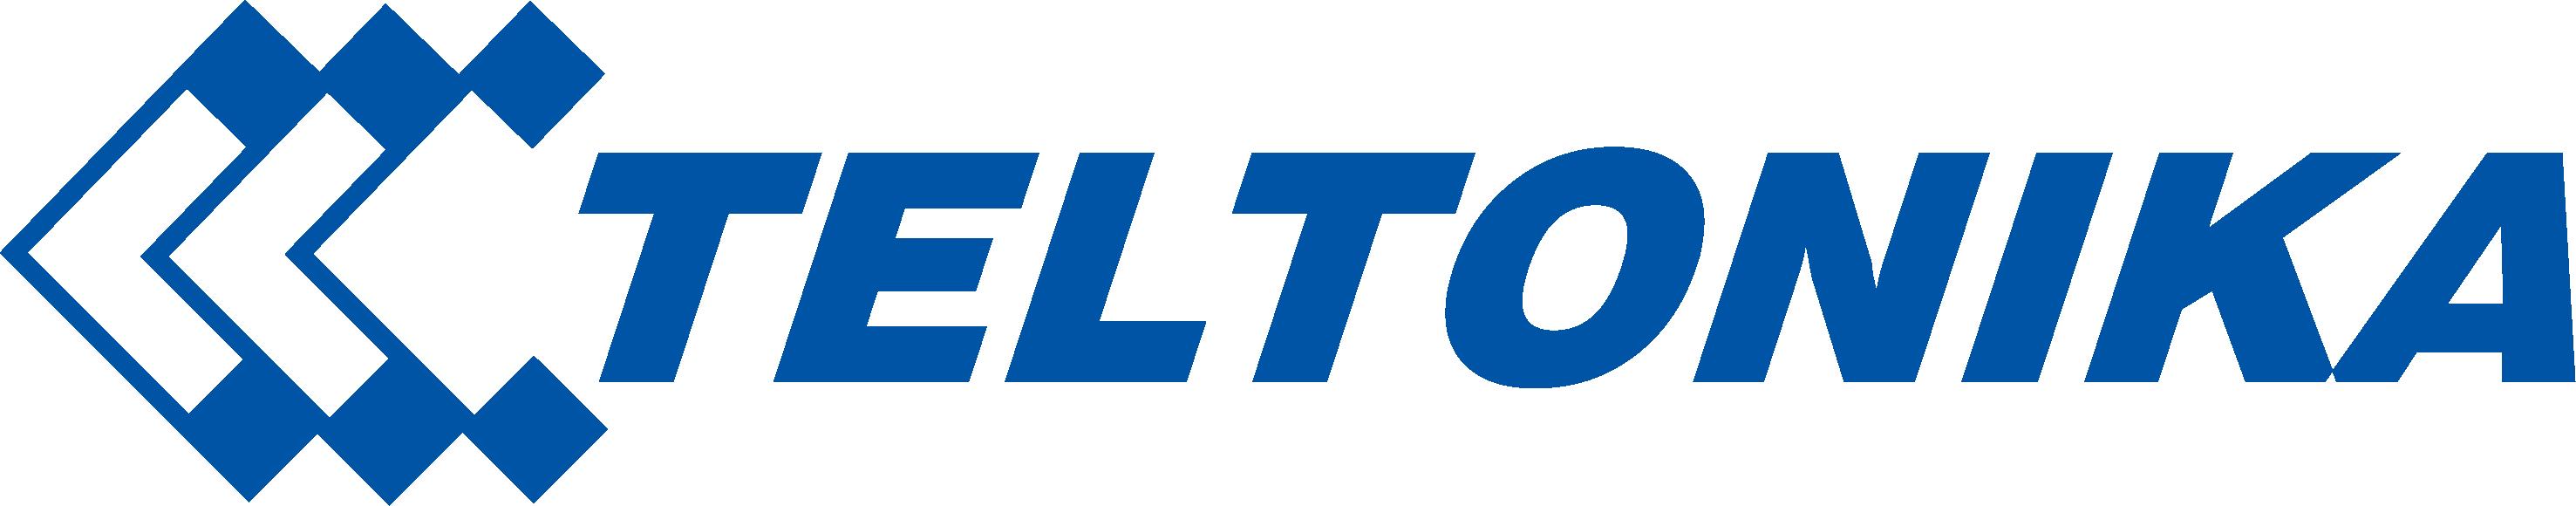 Teltonika-logo